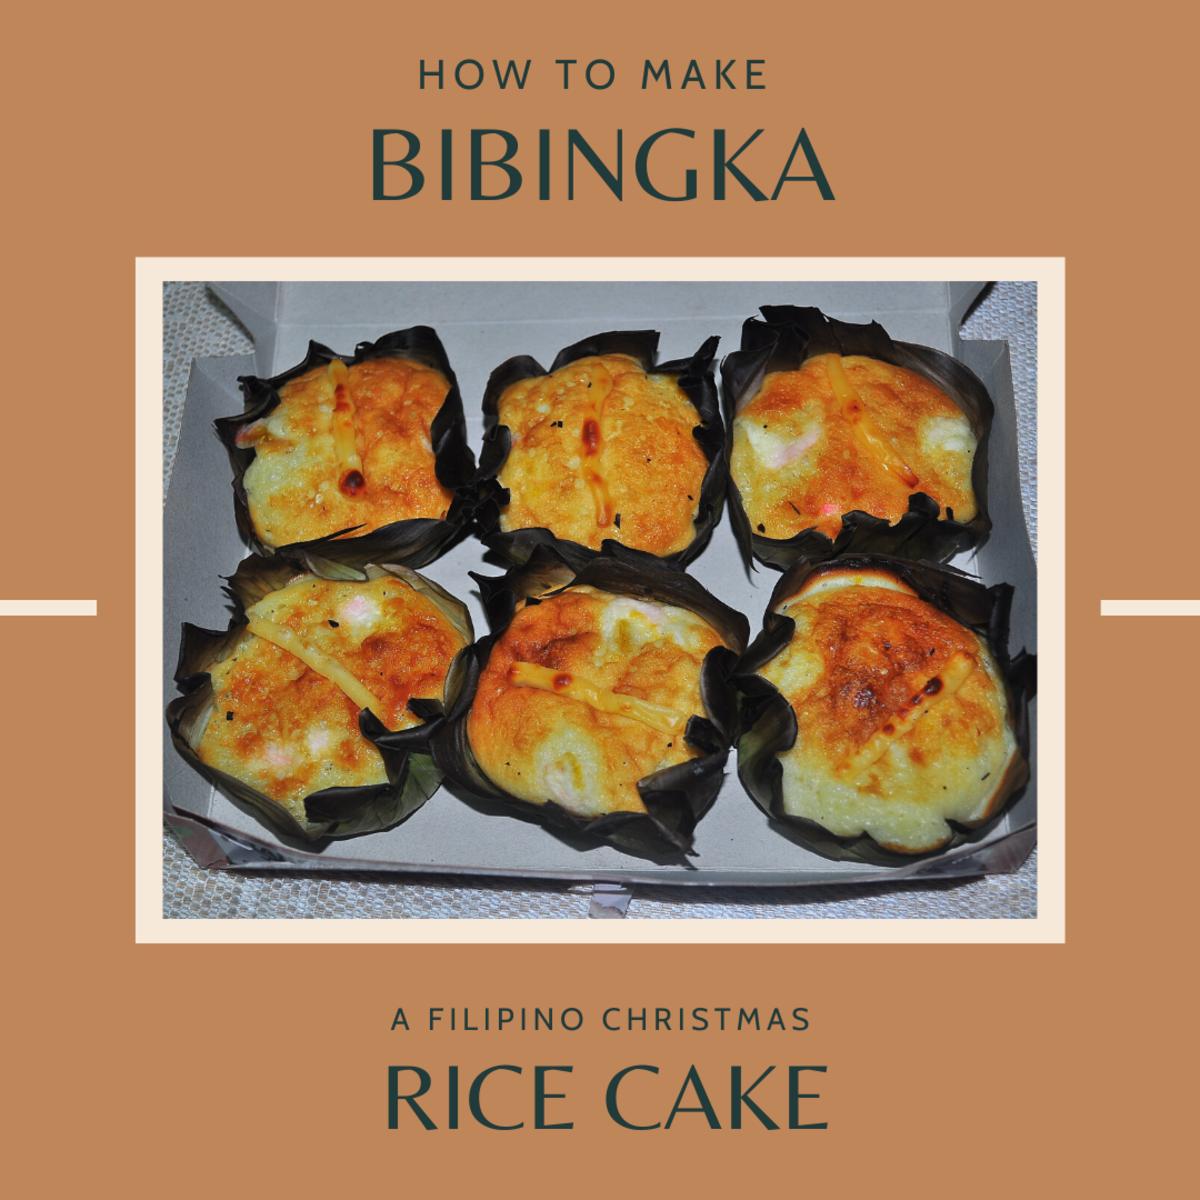 Easy Filipino Bibingka (Rice Cake) Recipe for Christmas